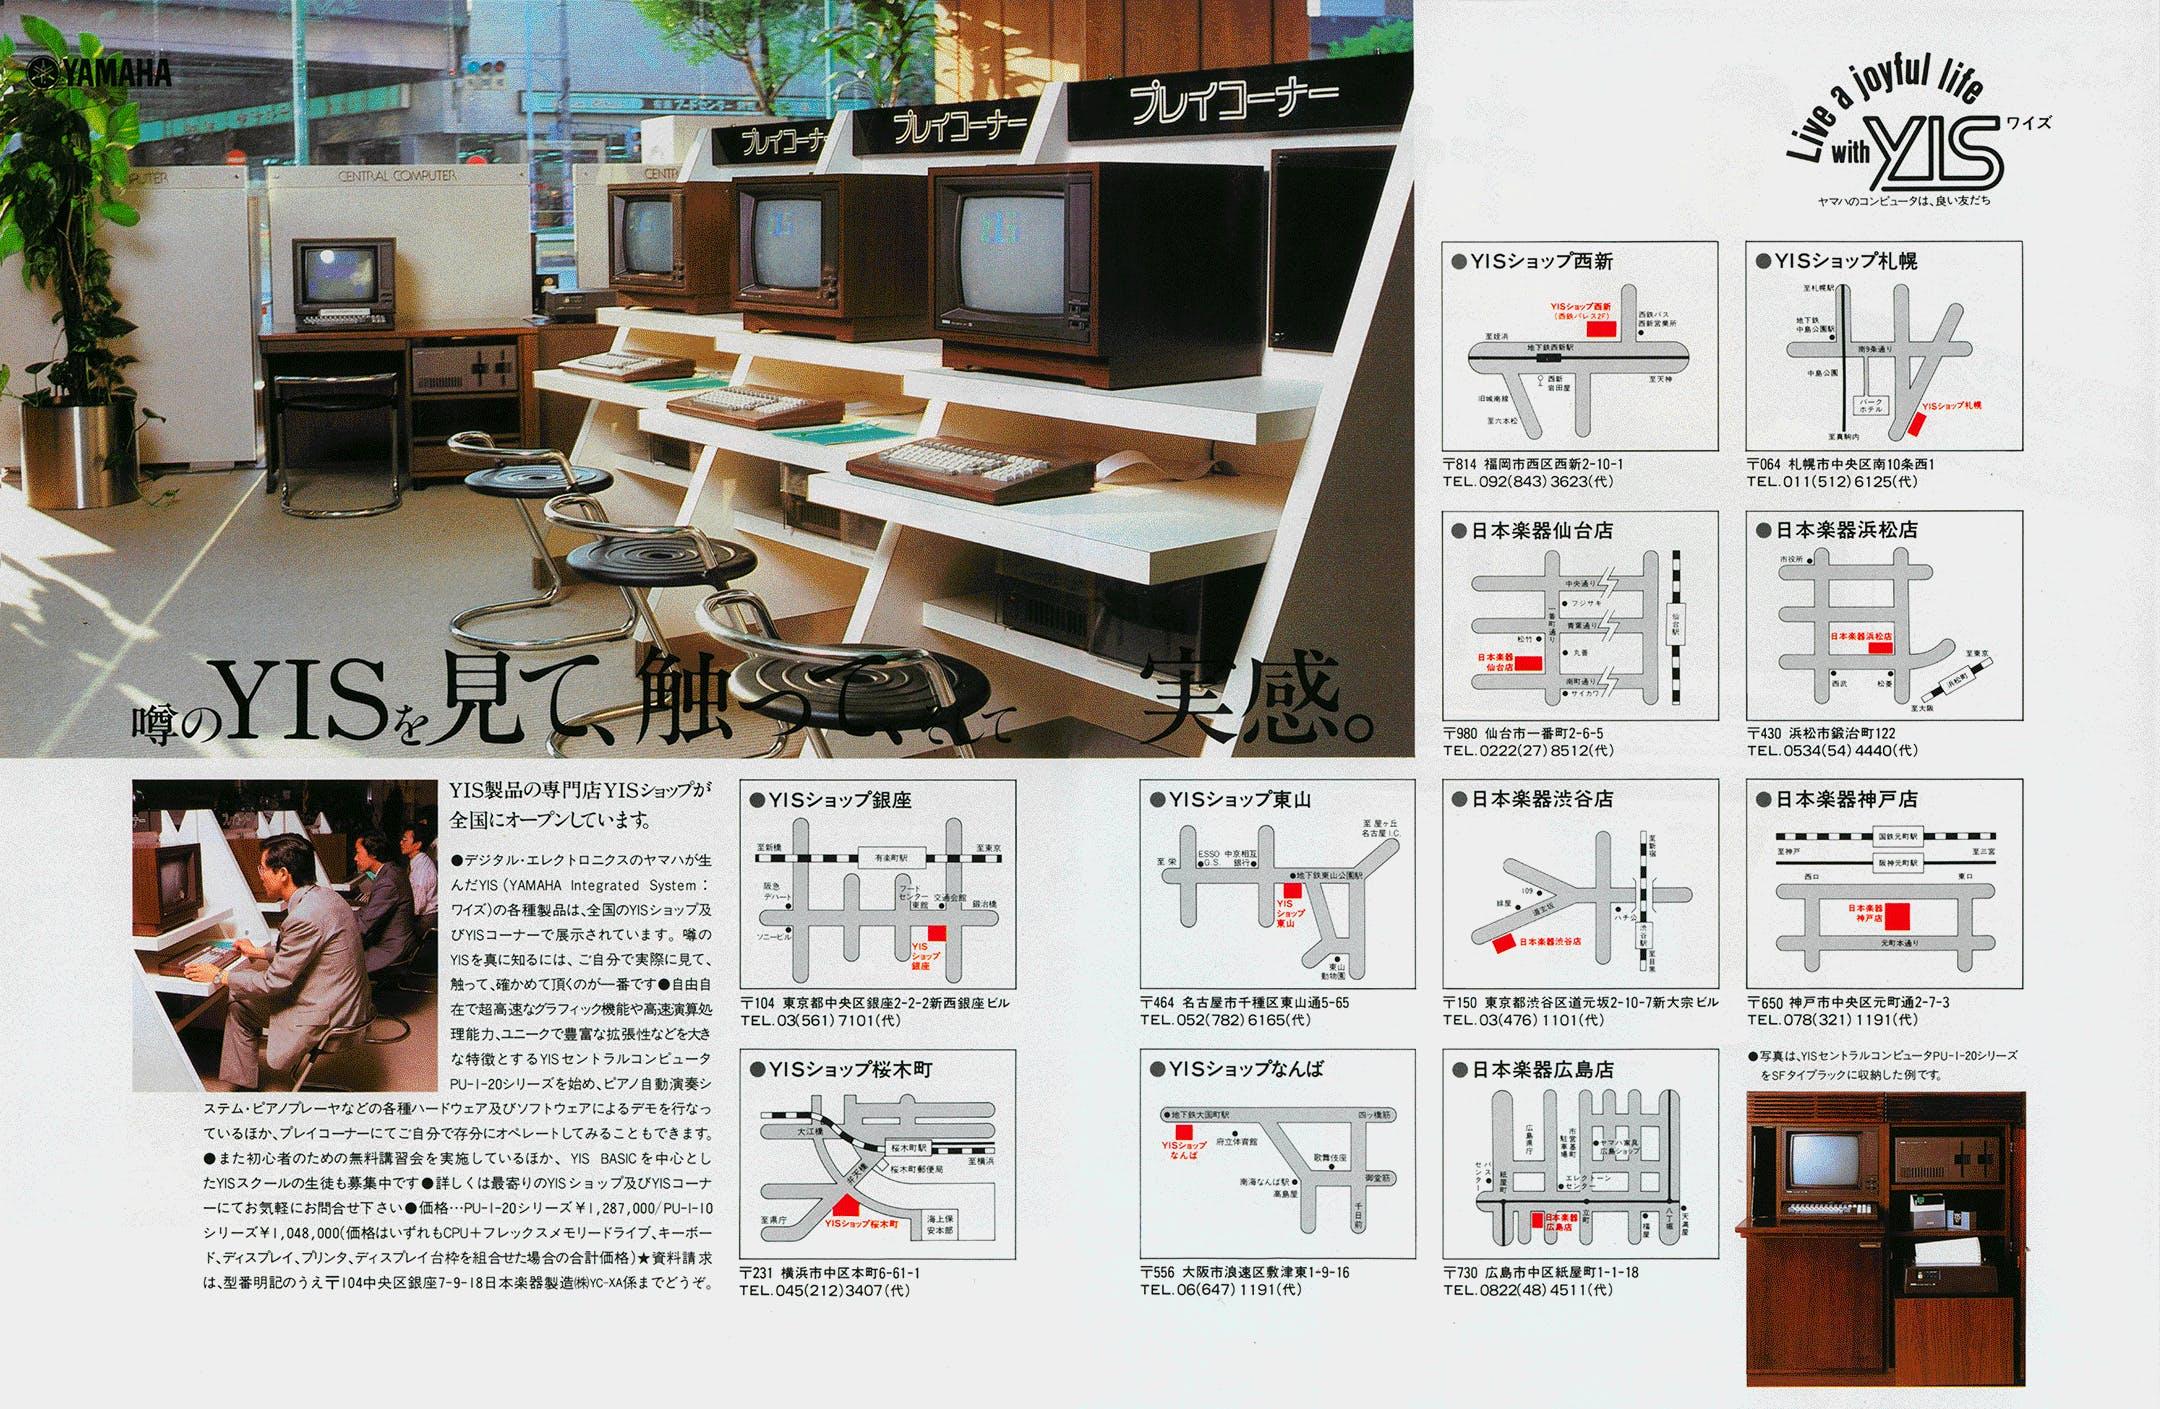 Yamaha YIS advertisement ASCII japan 7 1982